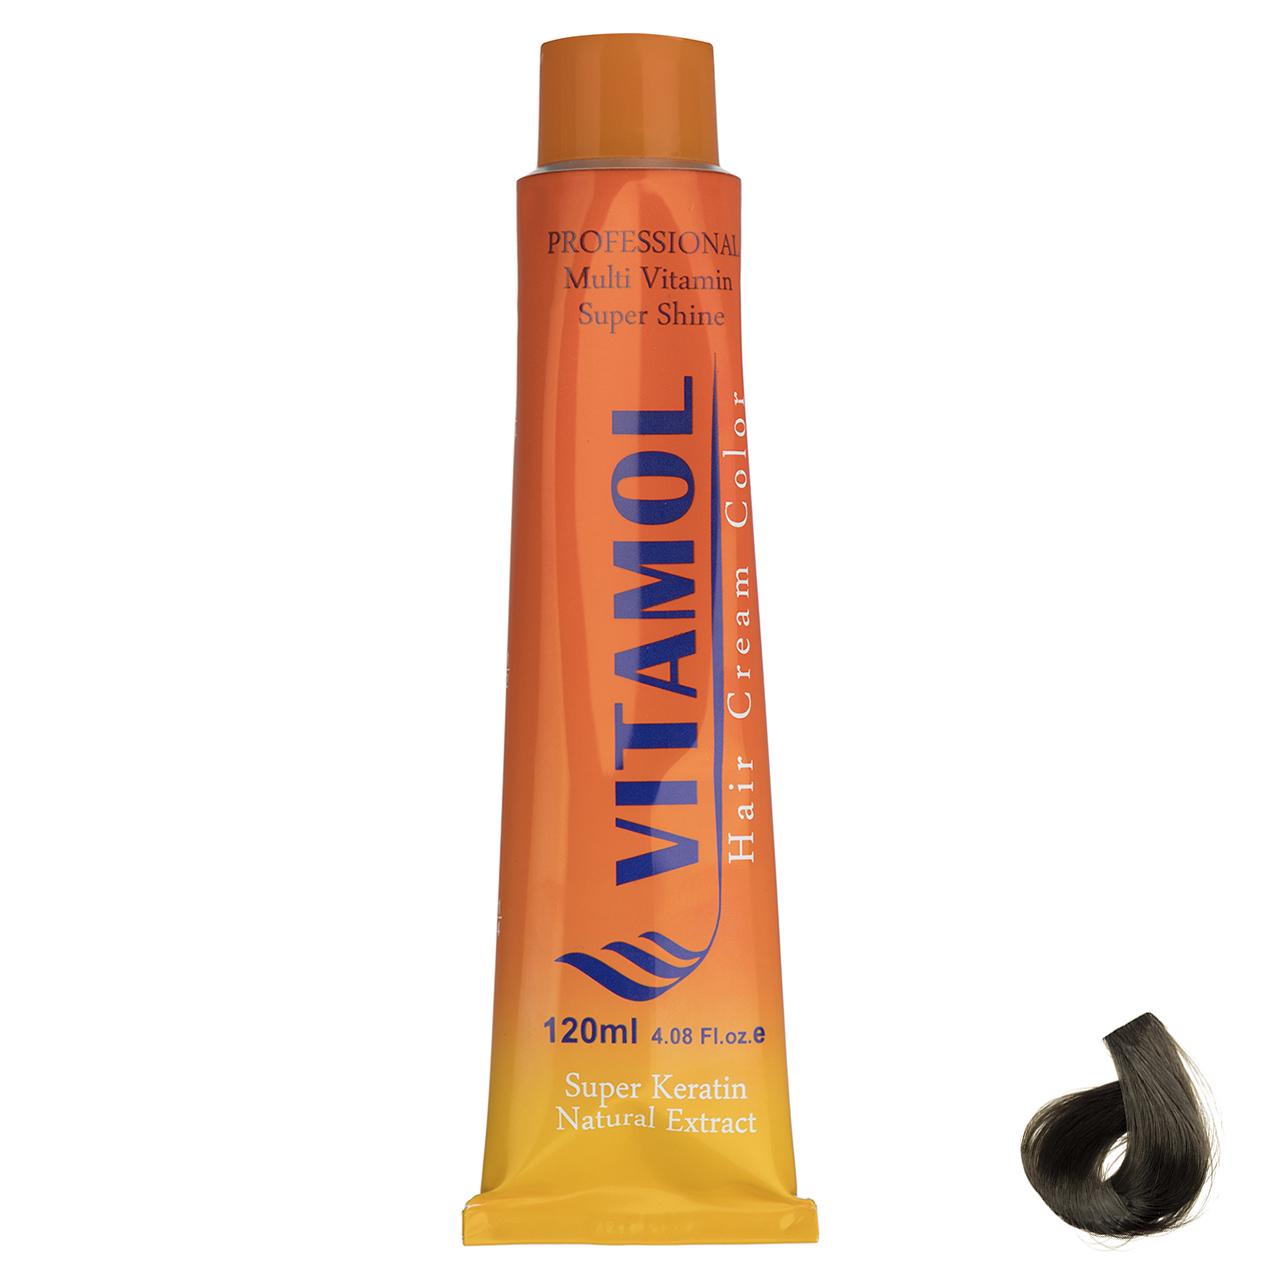 رنگ مو گیاهی ویتامول سری Matt مدل Medium Blonde شماره 7.3